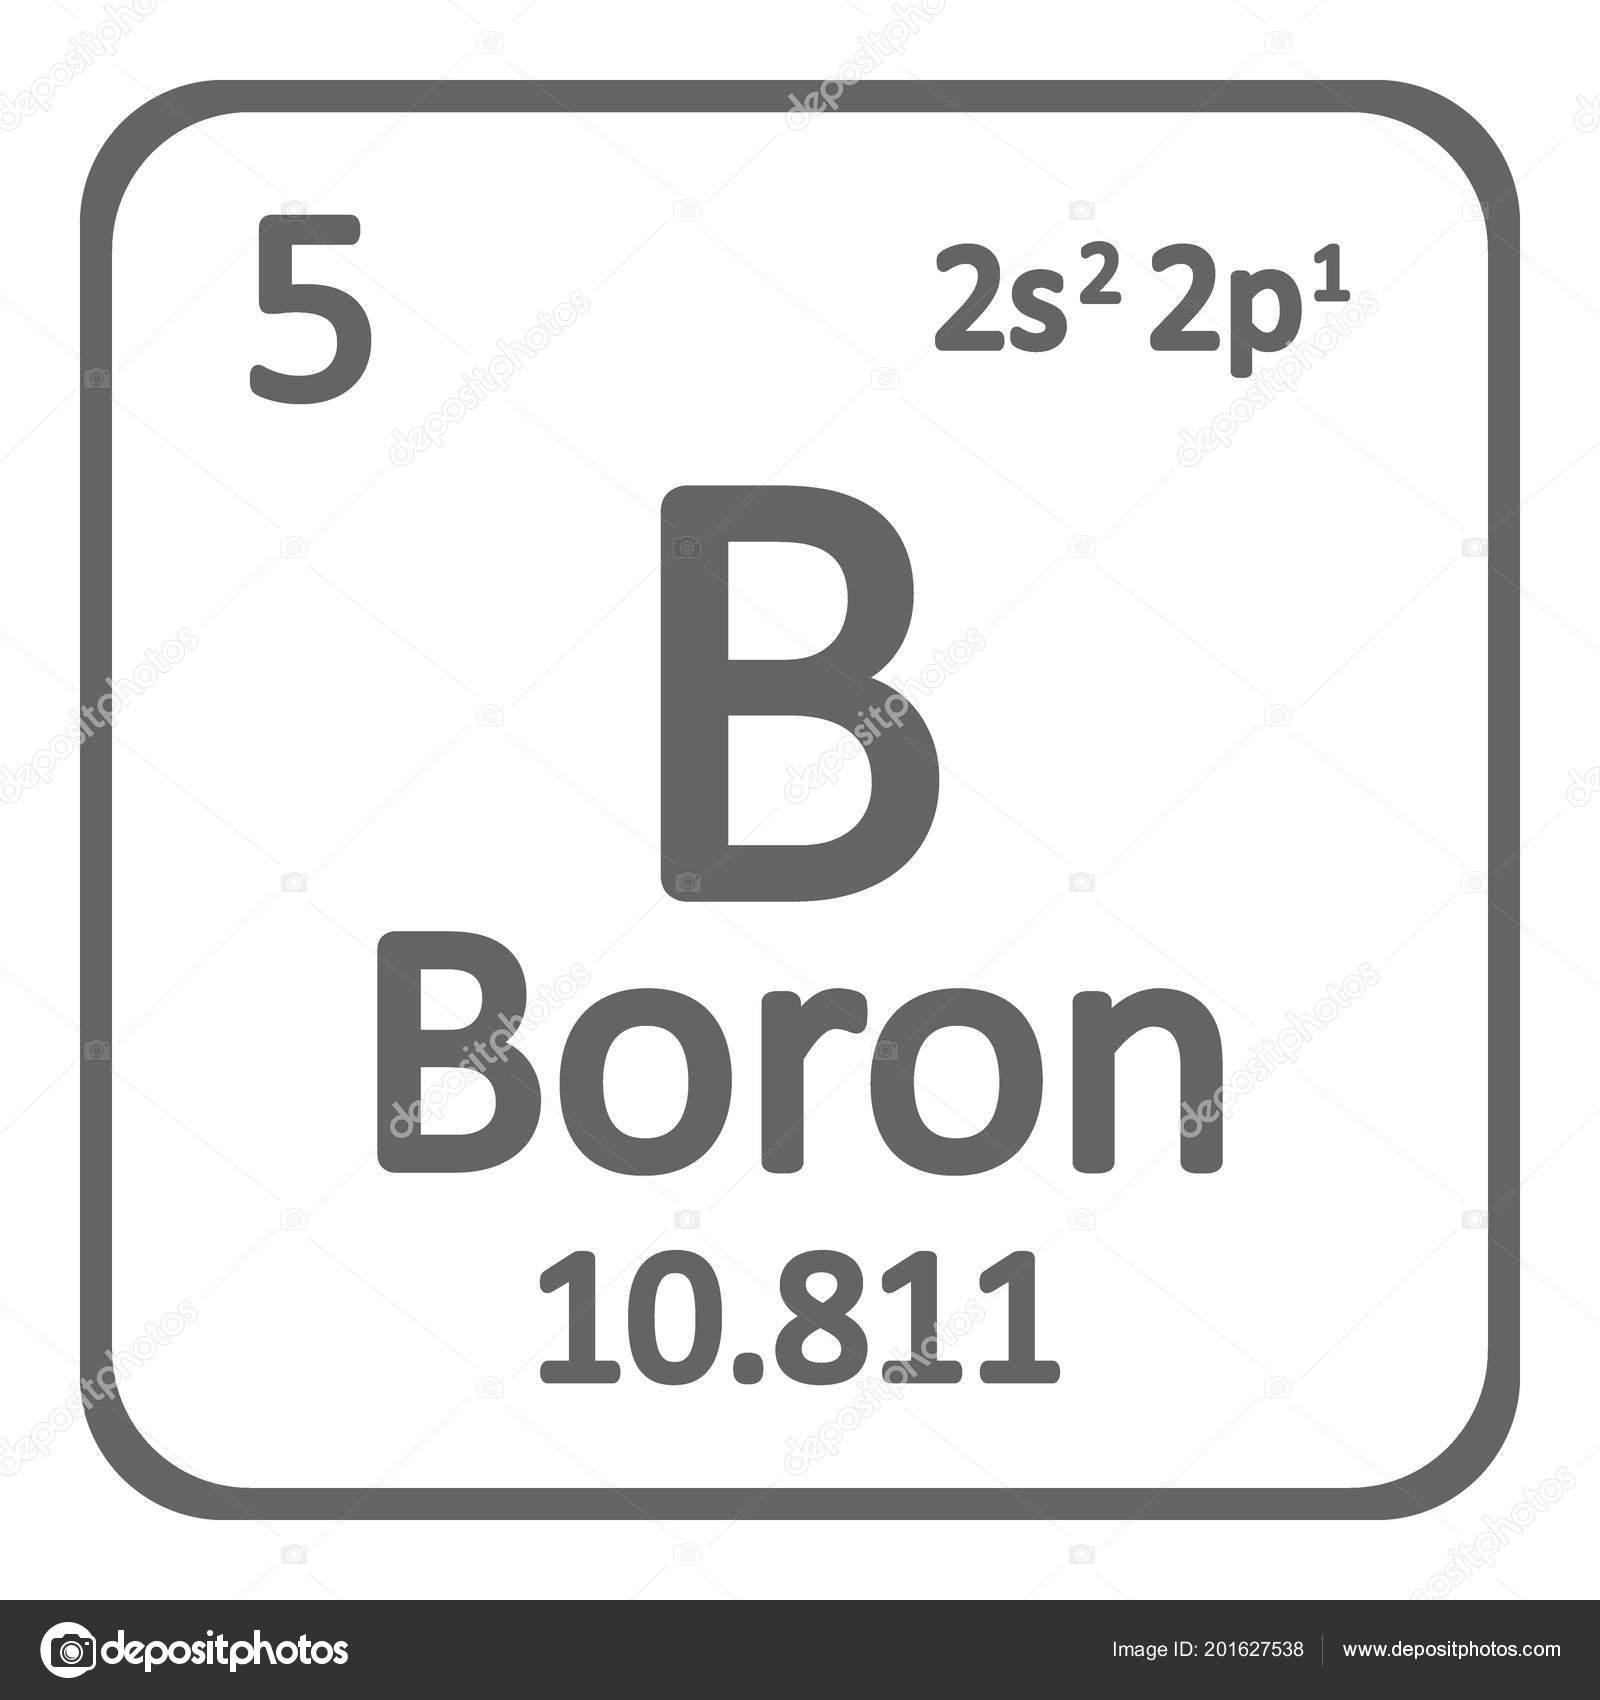 Tabla periodica elemento boro icono sobre fondo blanco ilustracin tabla periodica elemento boro icono sobre fondo blanco ilustracin vector archivo imgenes vectoriales urtaz Images